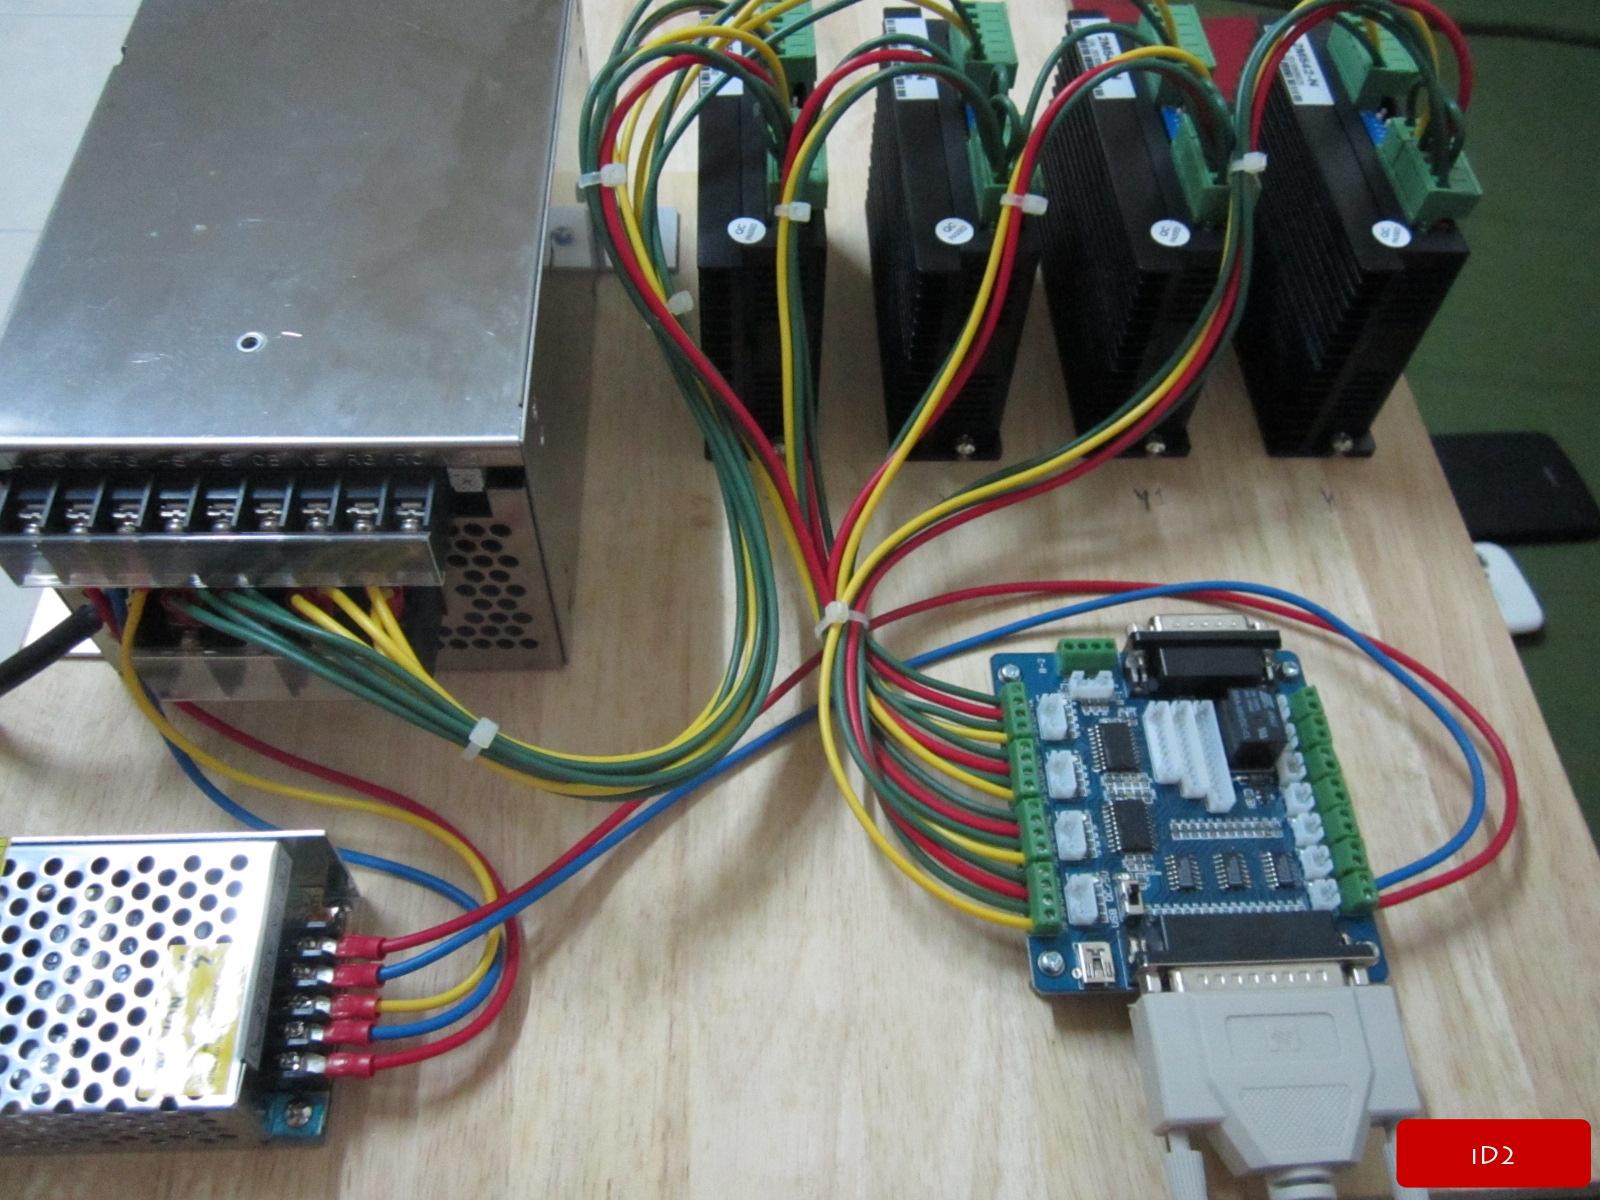 diy cnc wiring wiring diagram used diy cnc wiring harness [ 1600 x 1200 Pixel ]